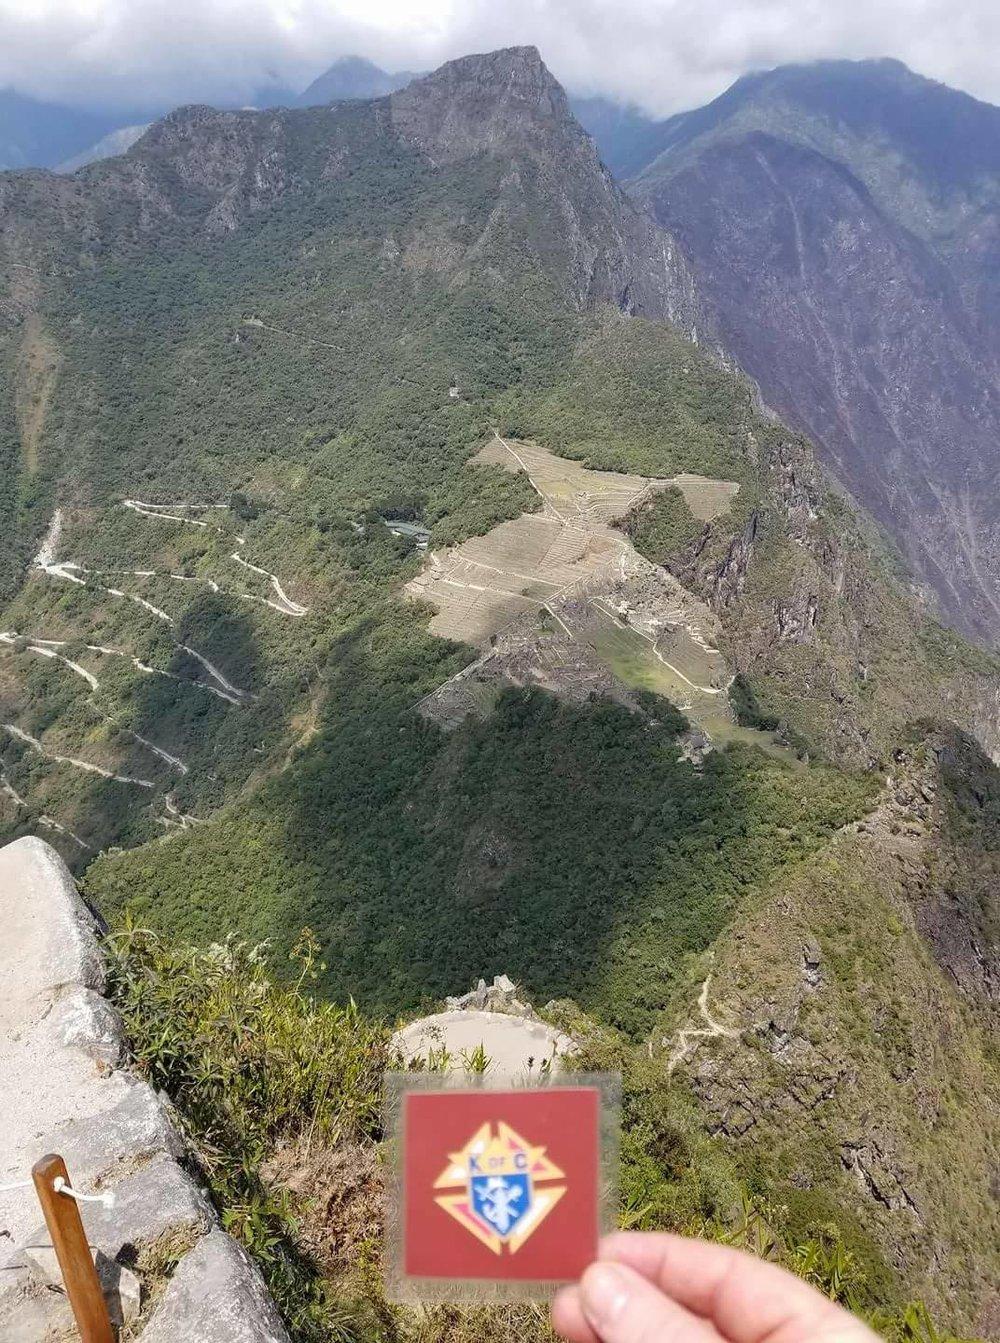 Stuart Brady vacationing in Machu Picchu